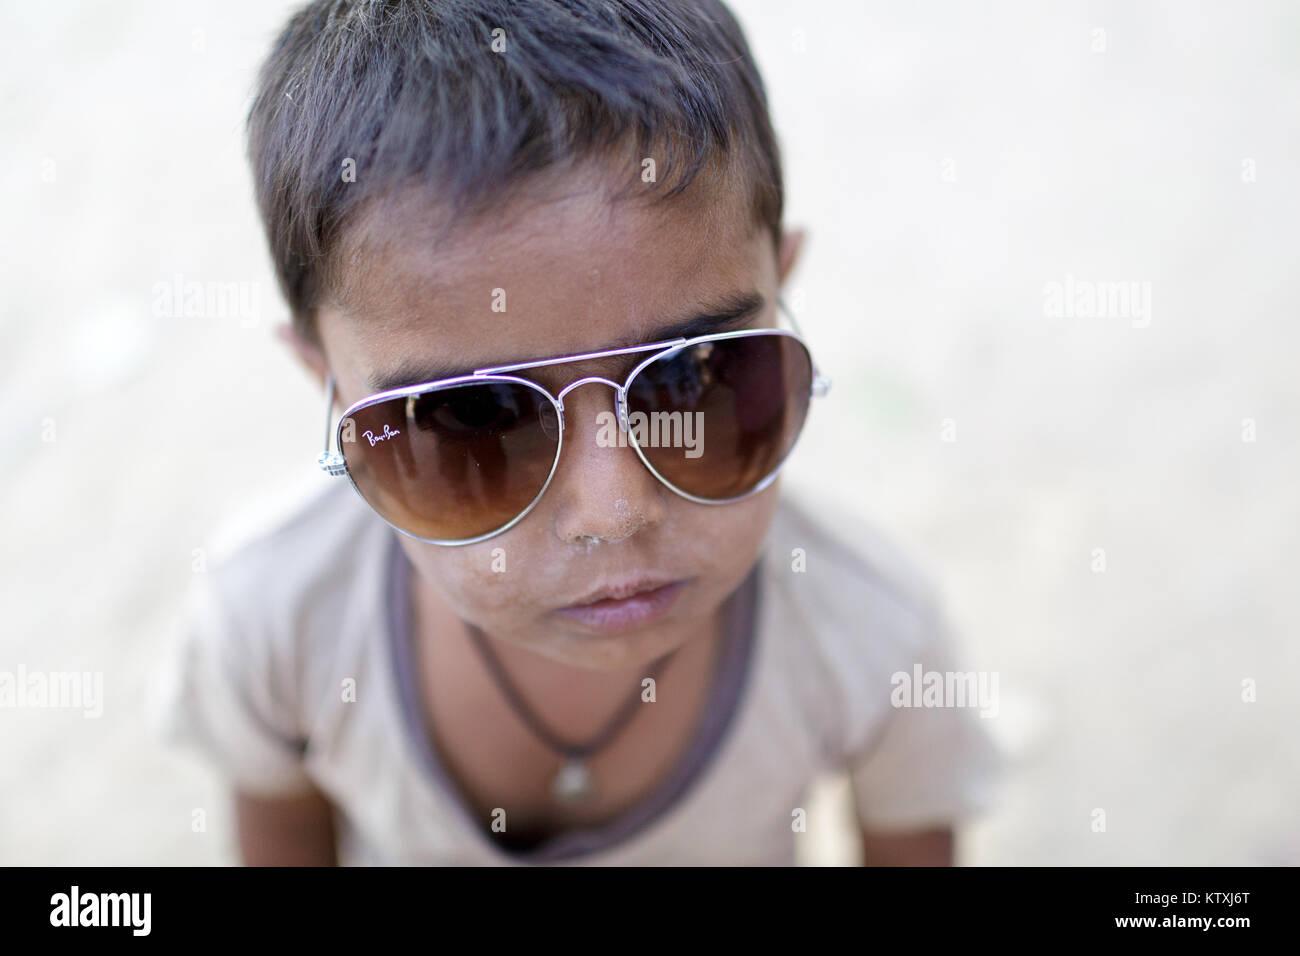 Small indian boy wearing oversized sunglasses, Village near Pushkar, Rajasthan, India. Stock Photo